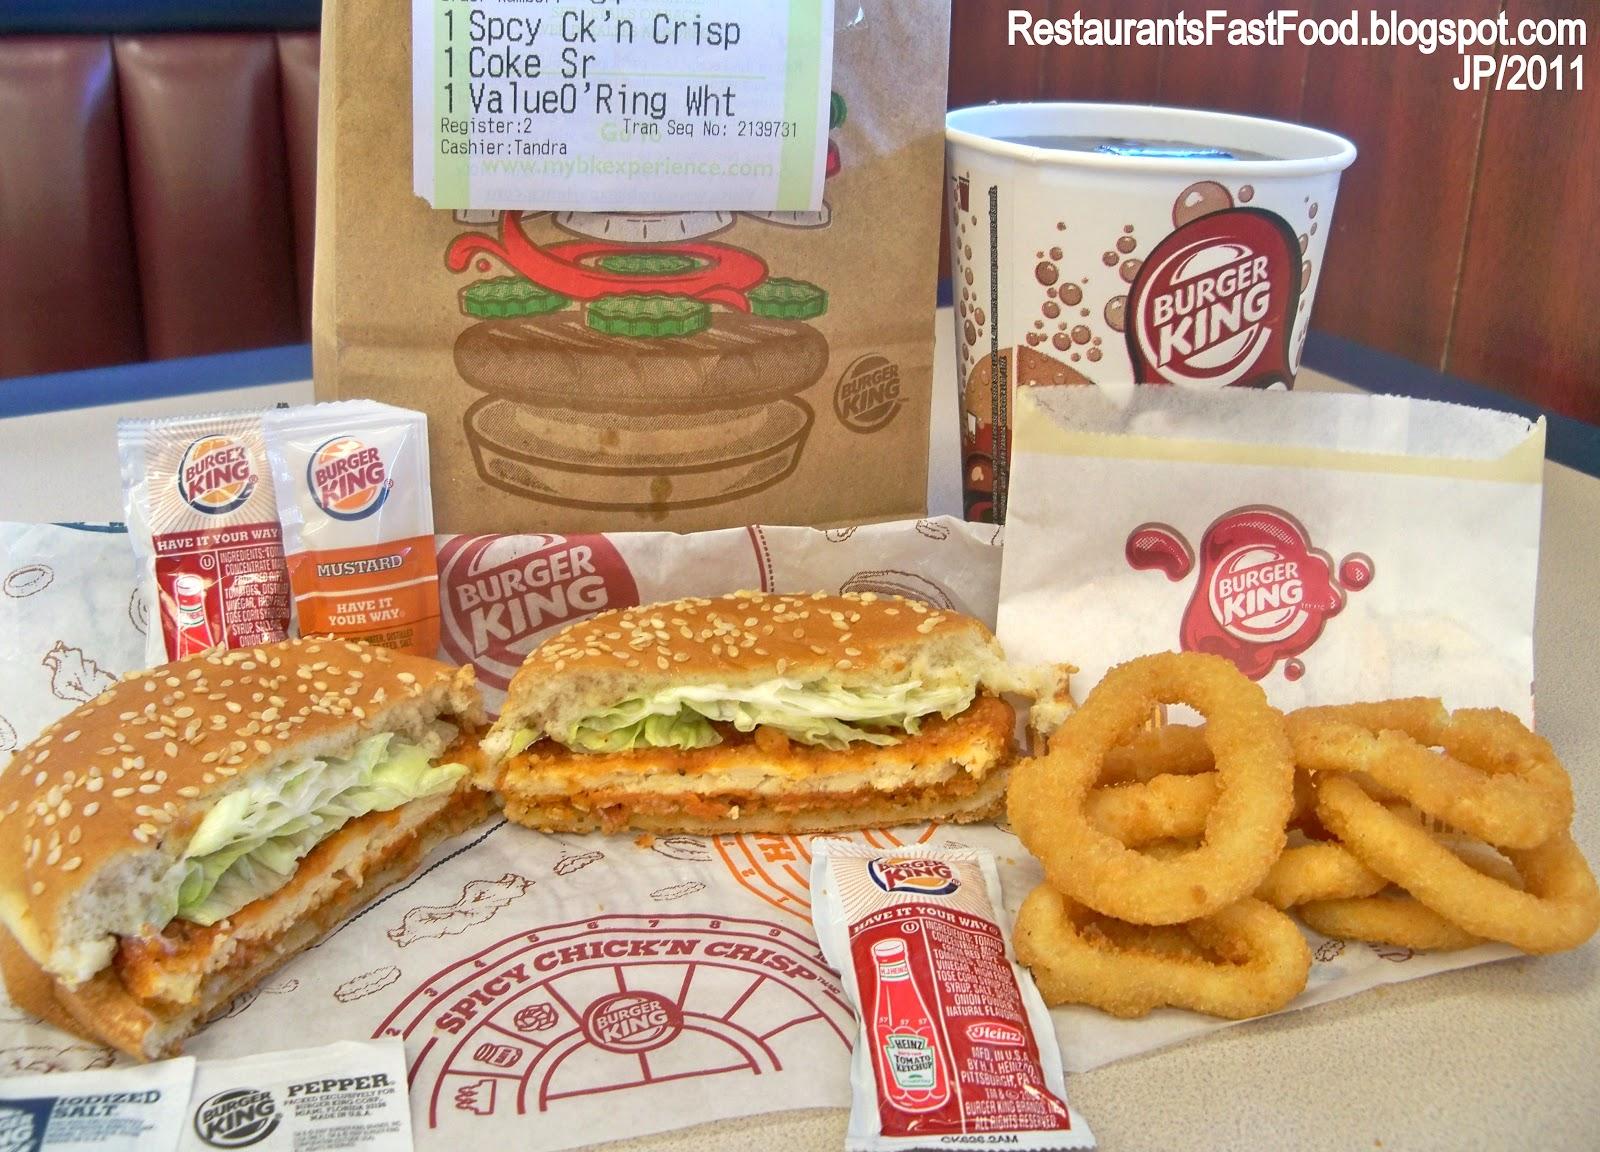 Fast Food Restaurants That Serve Seafood